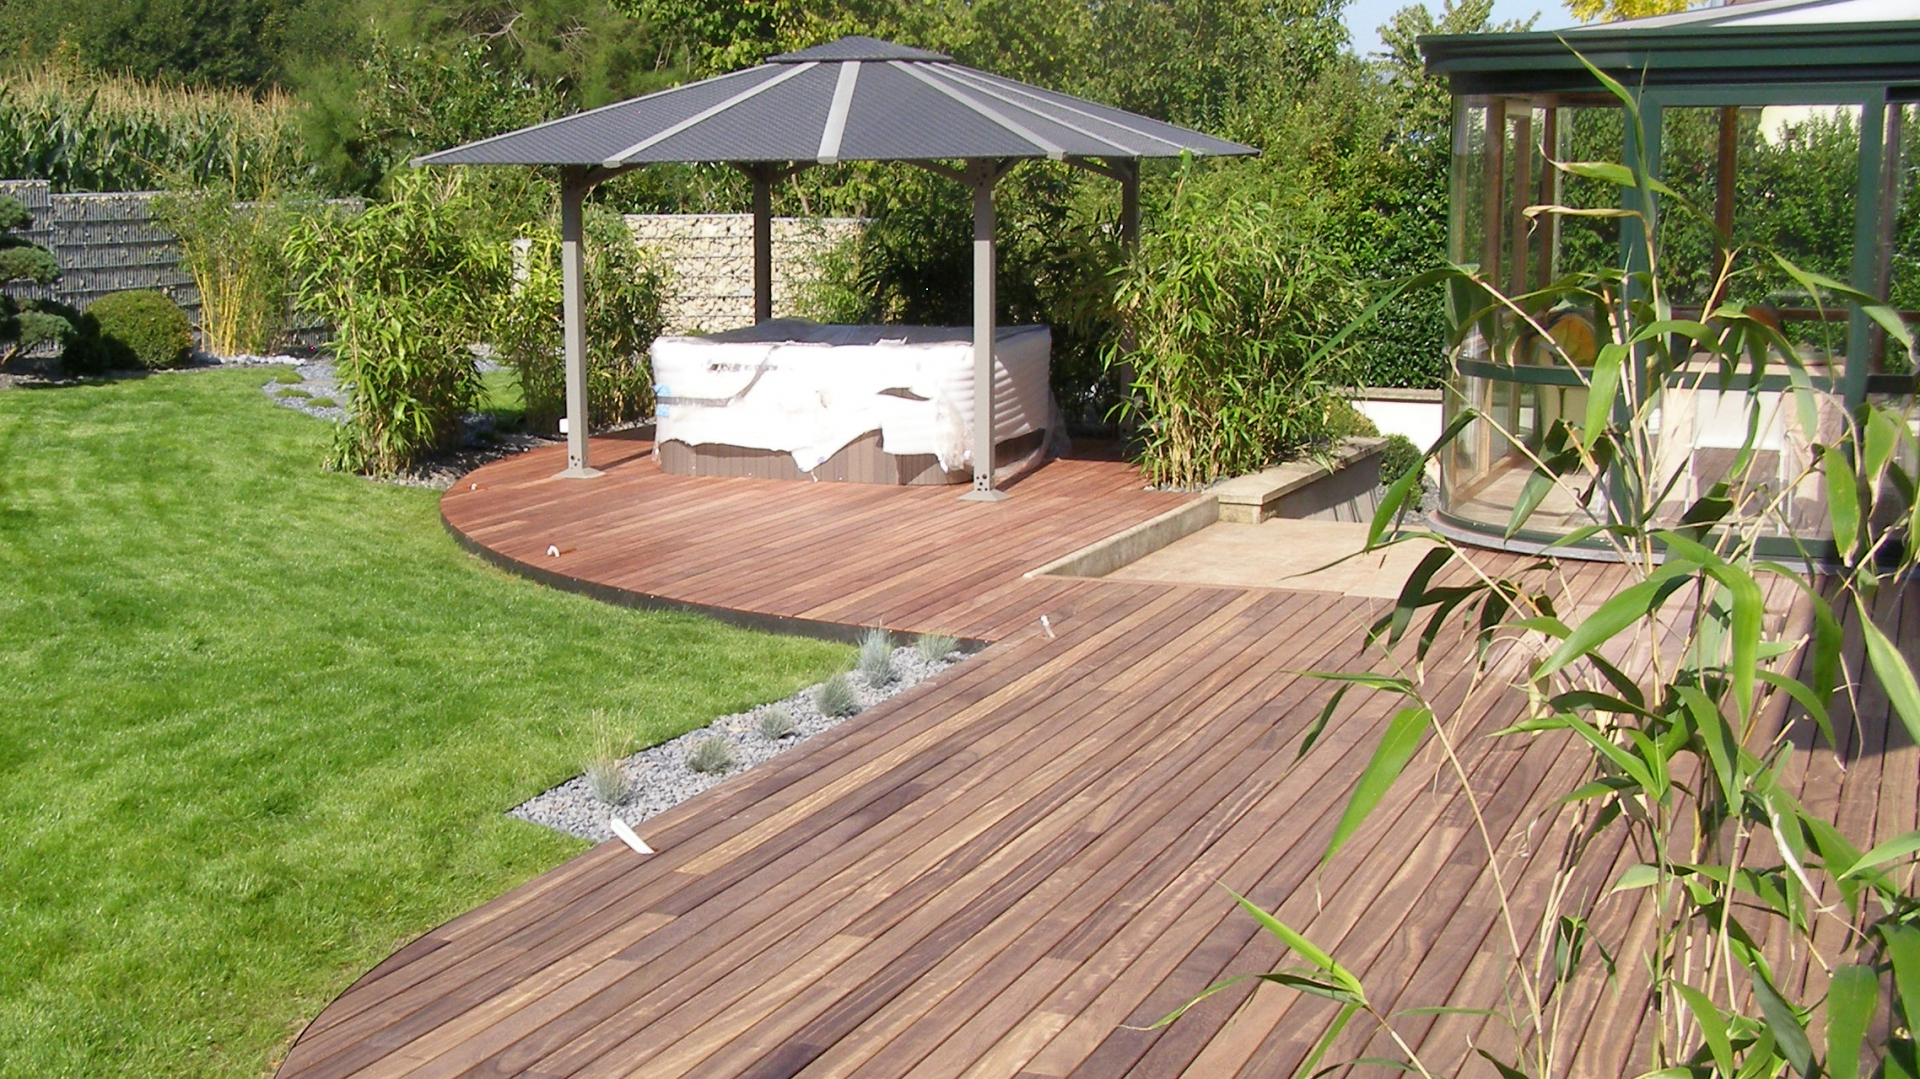 Dřevěné terasy, terasová prkna ze dřeva | Fasády&Terasy s.r.o. - Dřevěné terasy Softline®